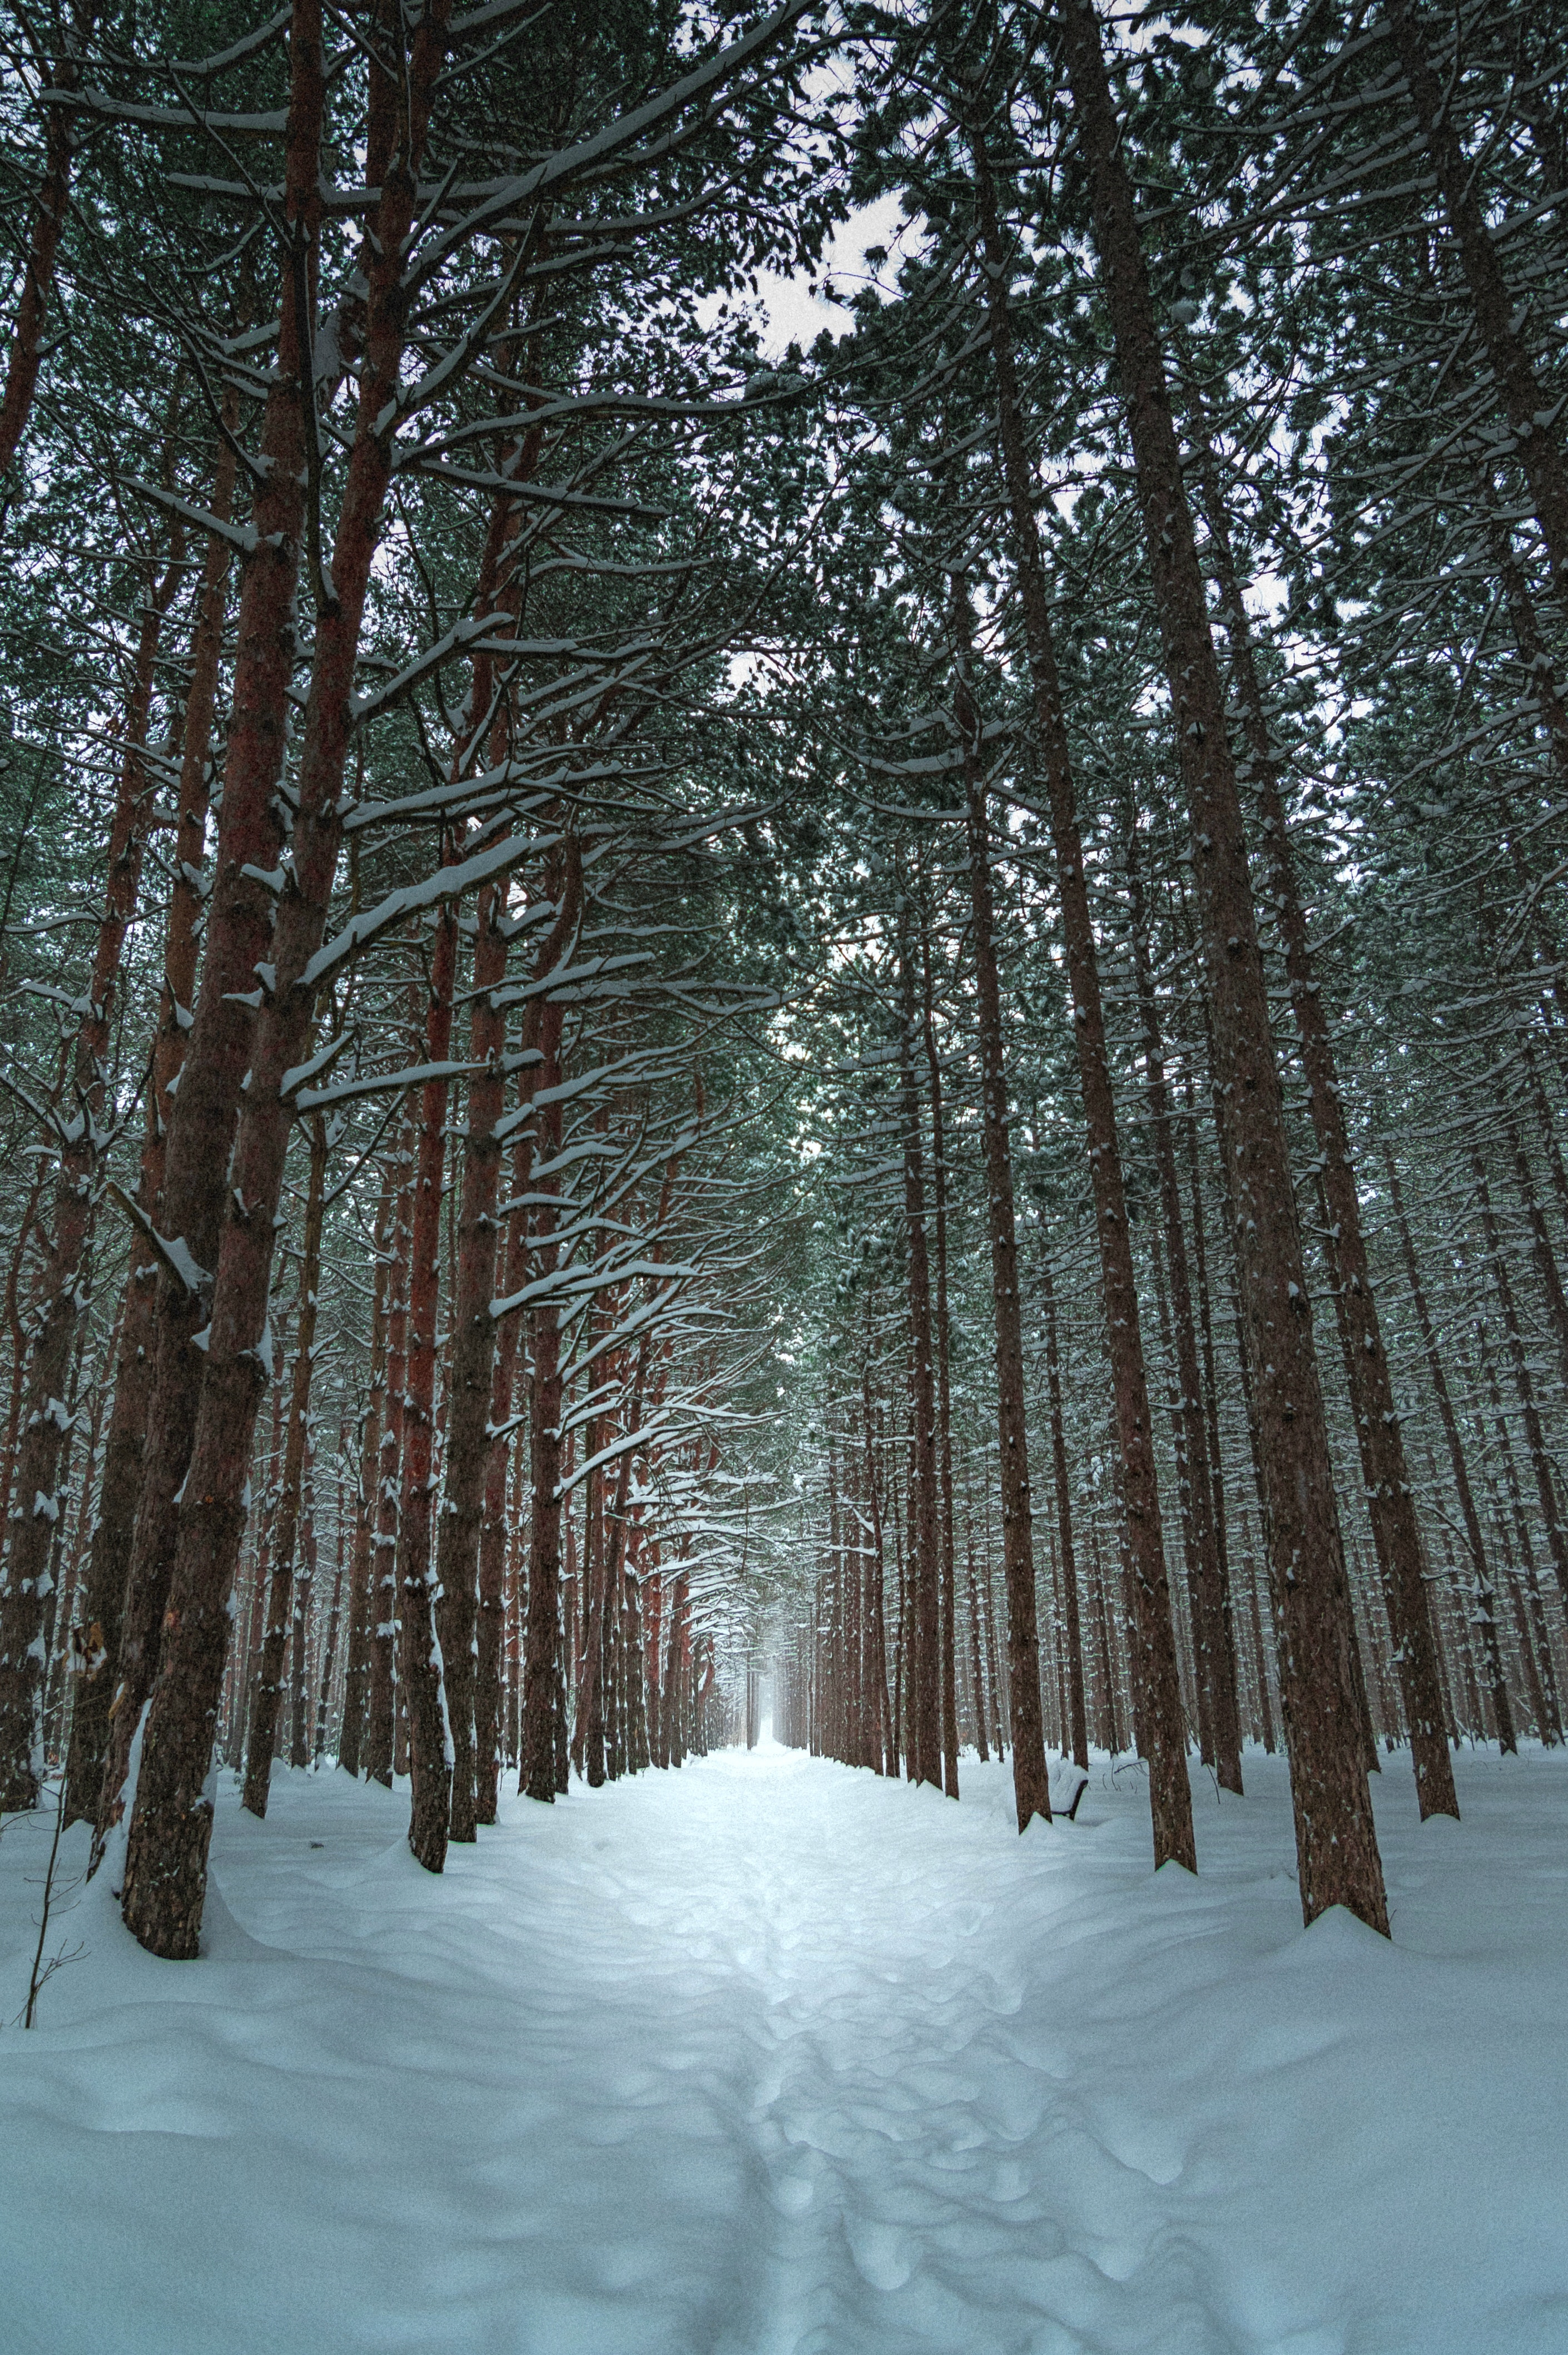 фото зимы леса на телефон опубликовала фото